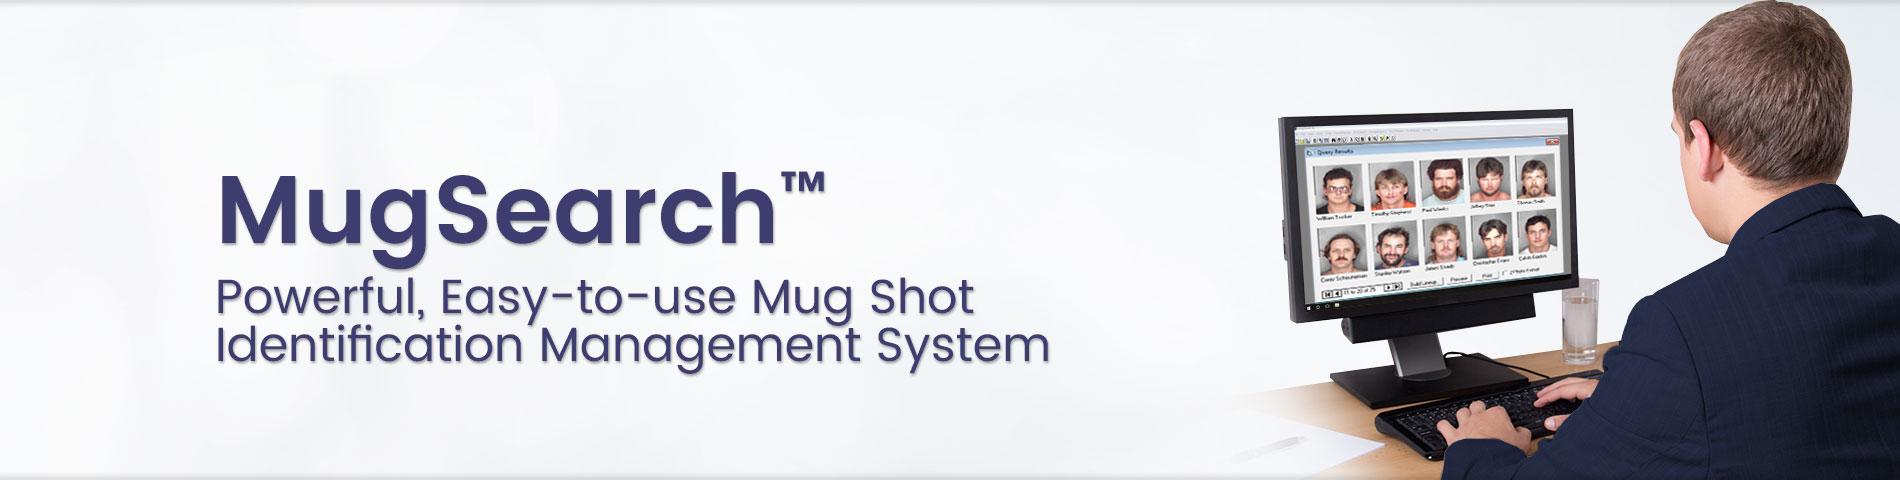 MugSearch